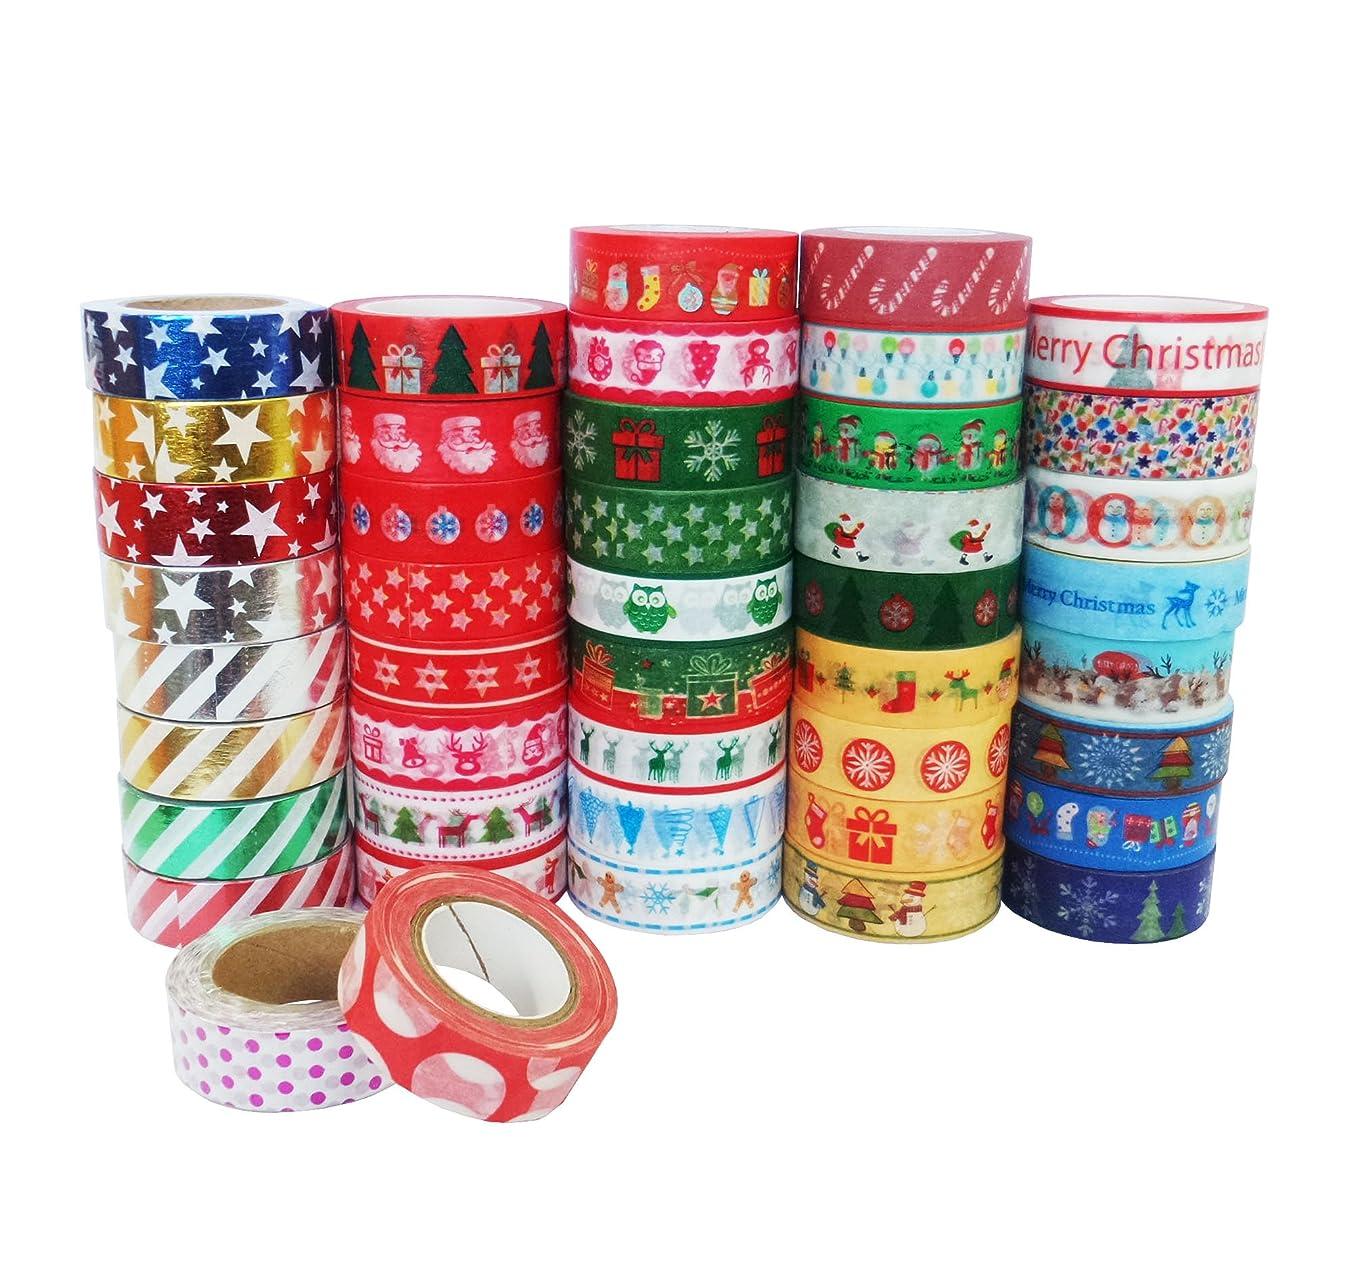 Yunko Decorative Craft Washi Masking Paper Tape Christmas Tape (Set of 12 Rolls)